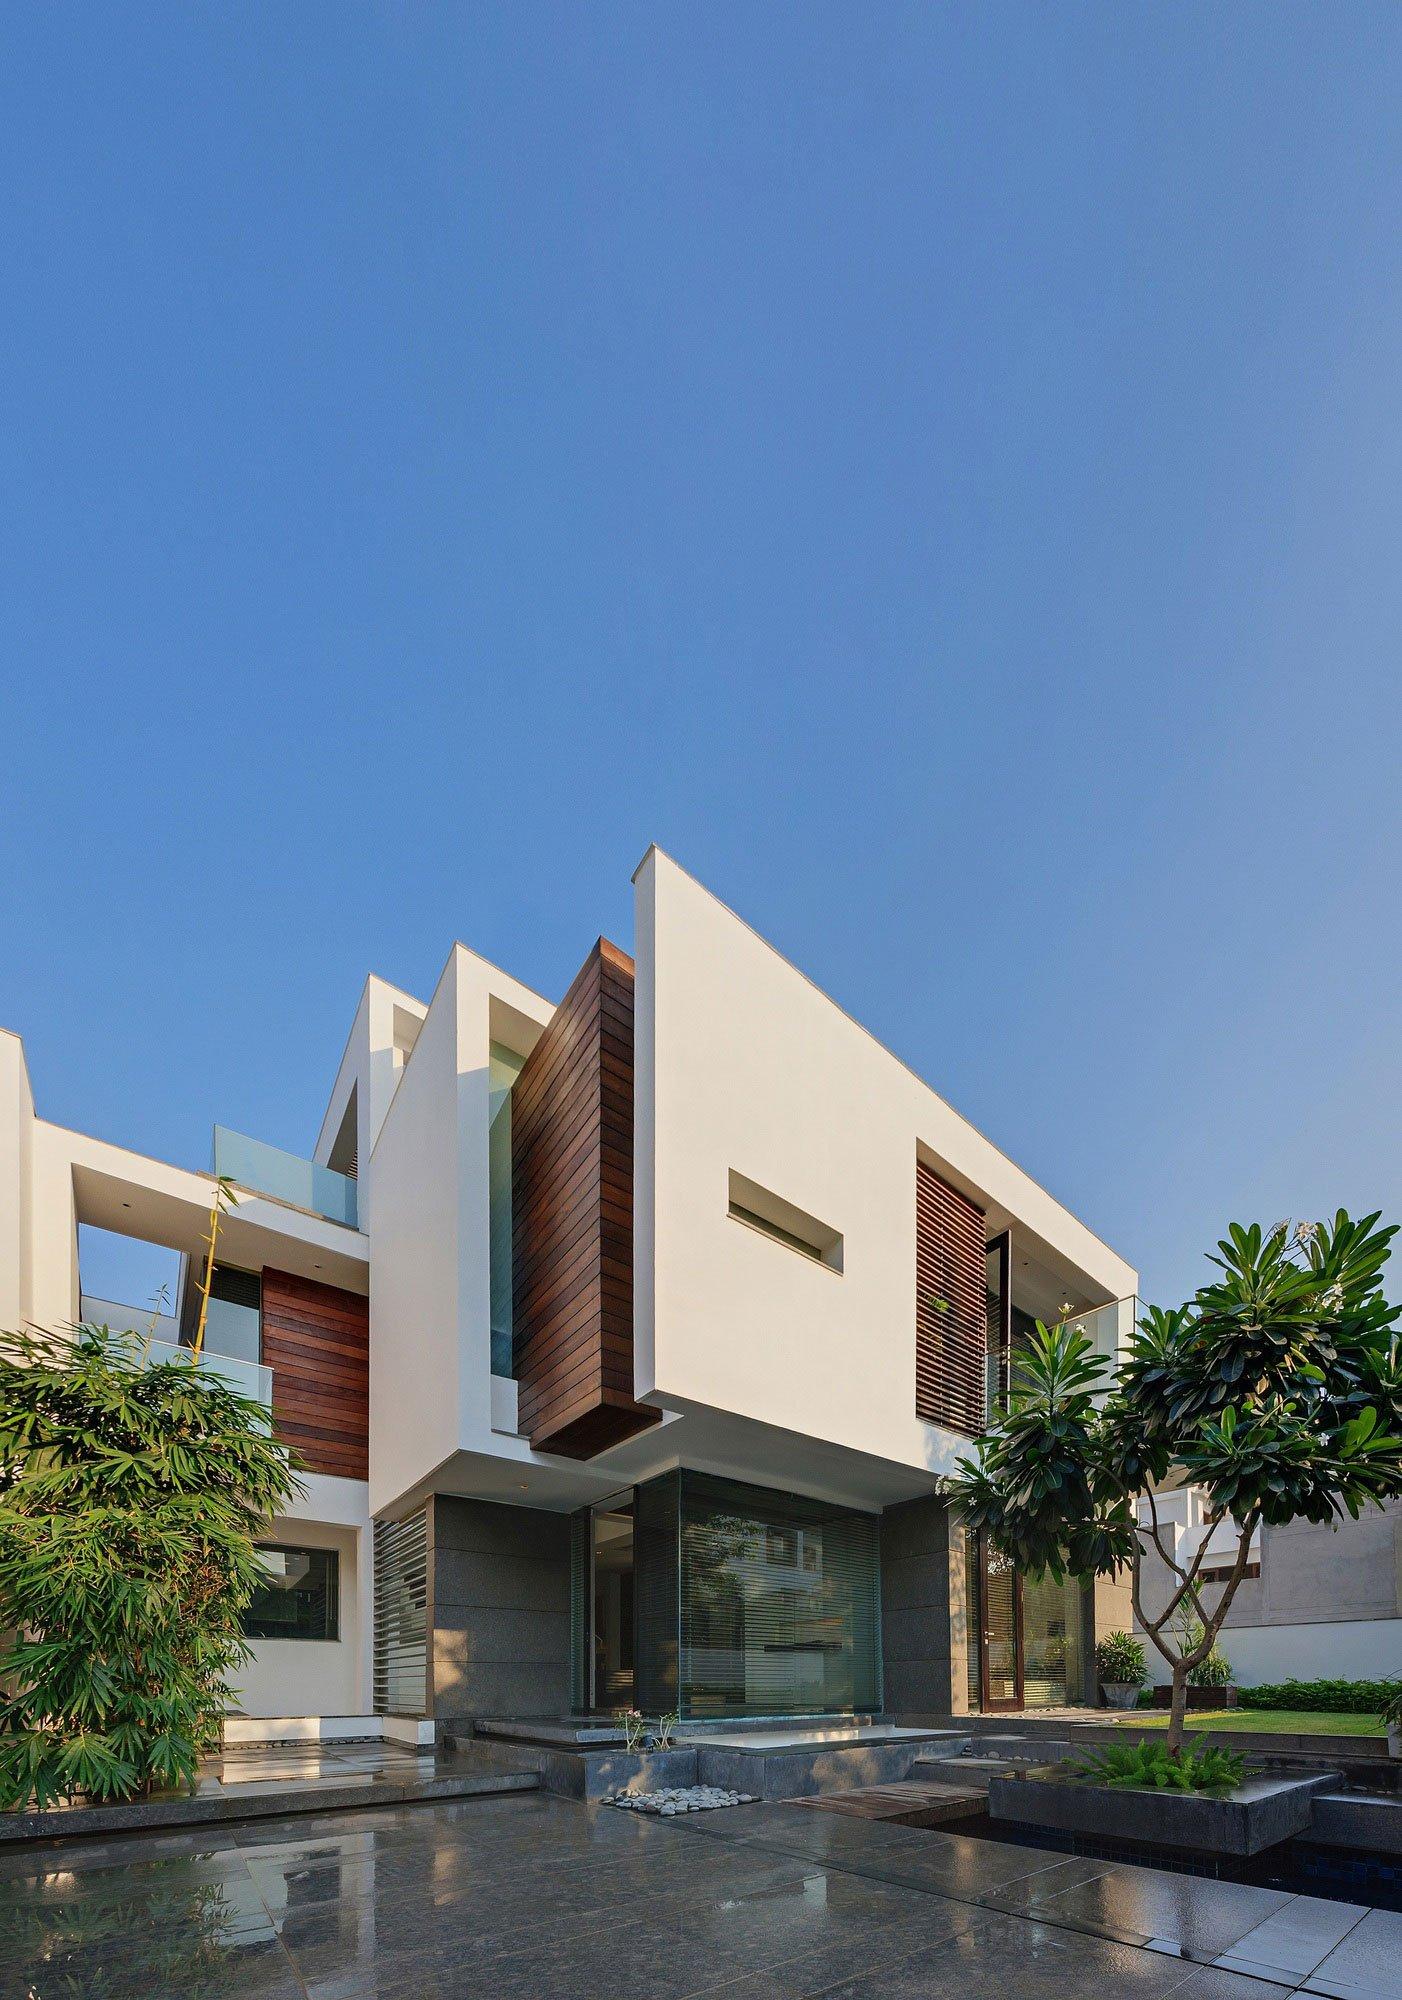 Overhang-House-02